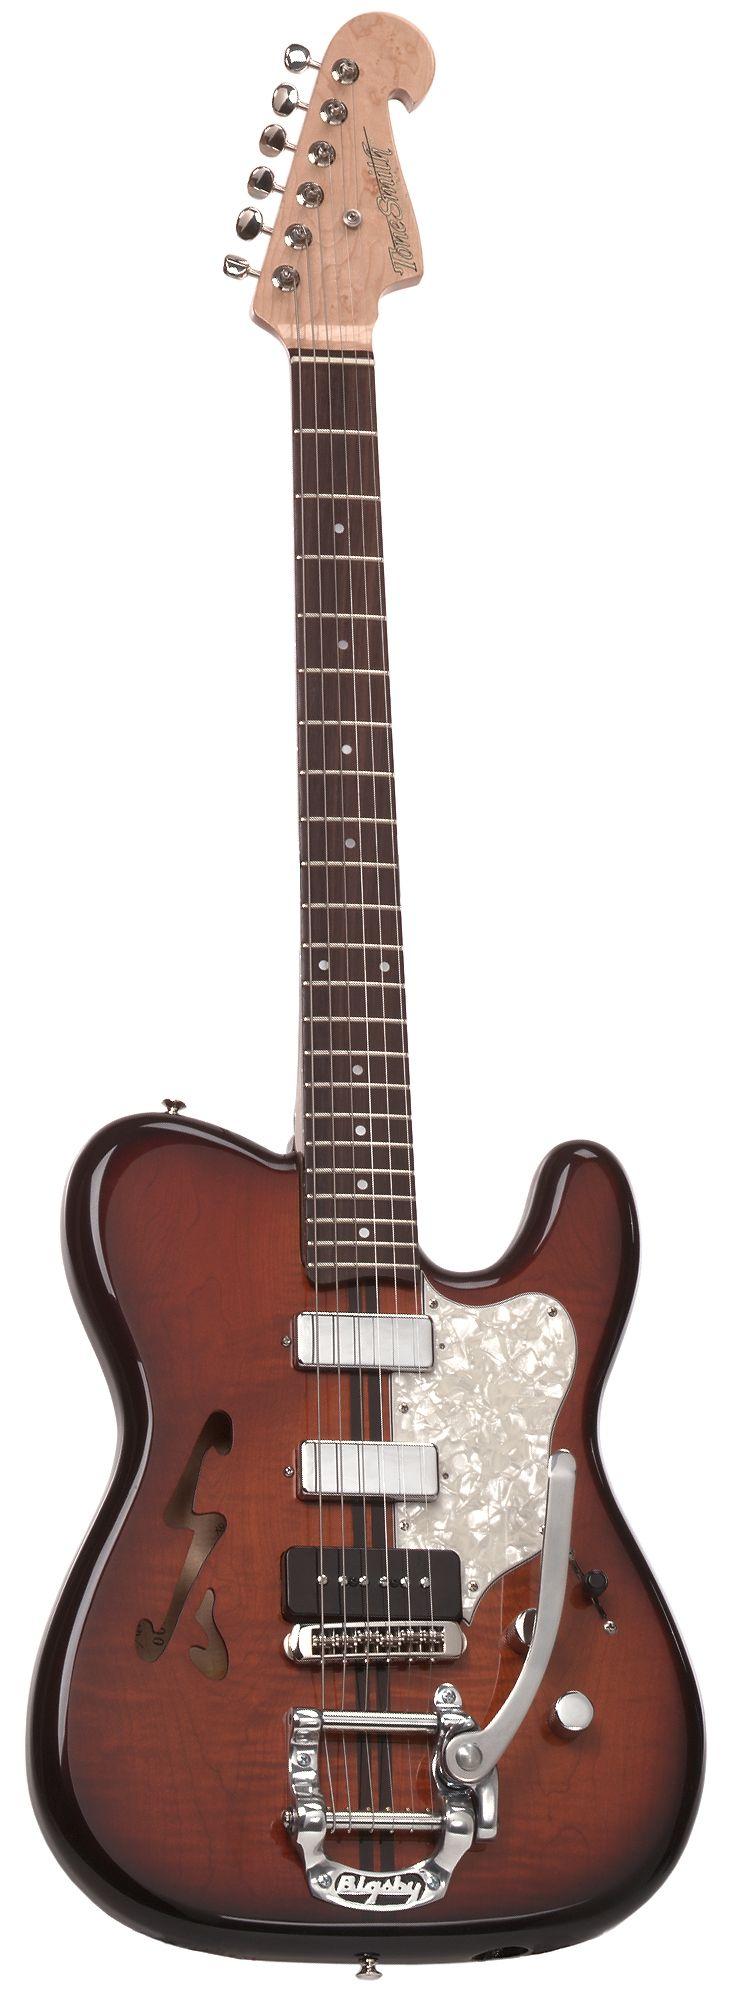 ToneSmith Guitars 510 Redwood